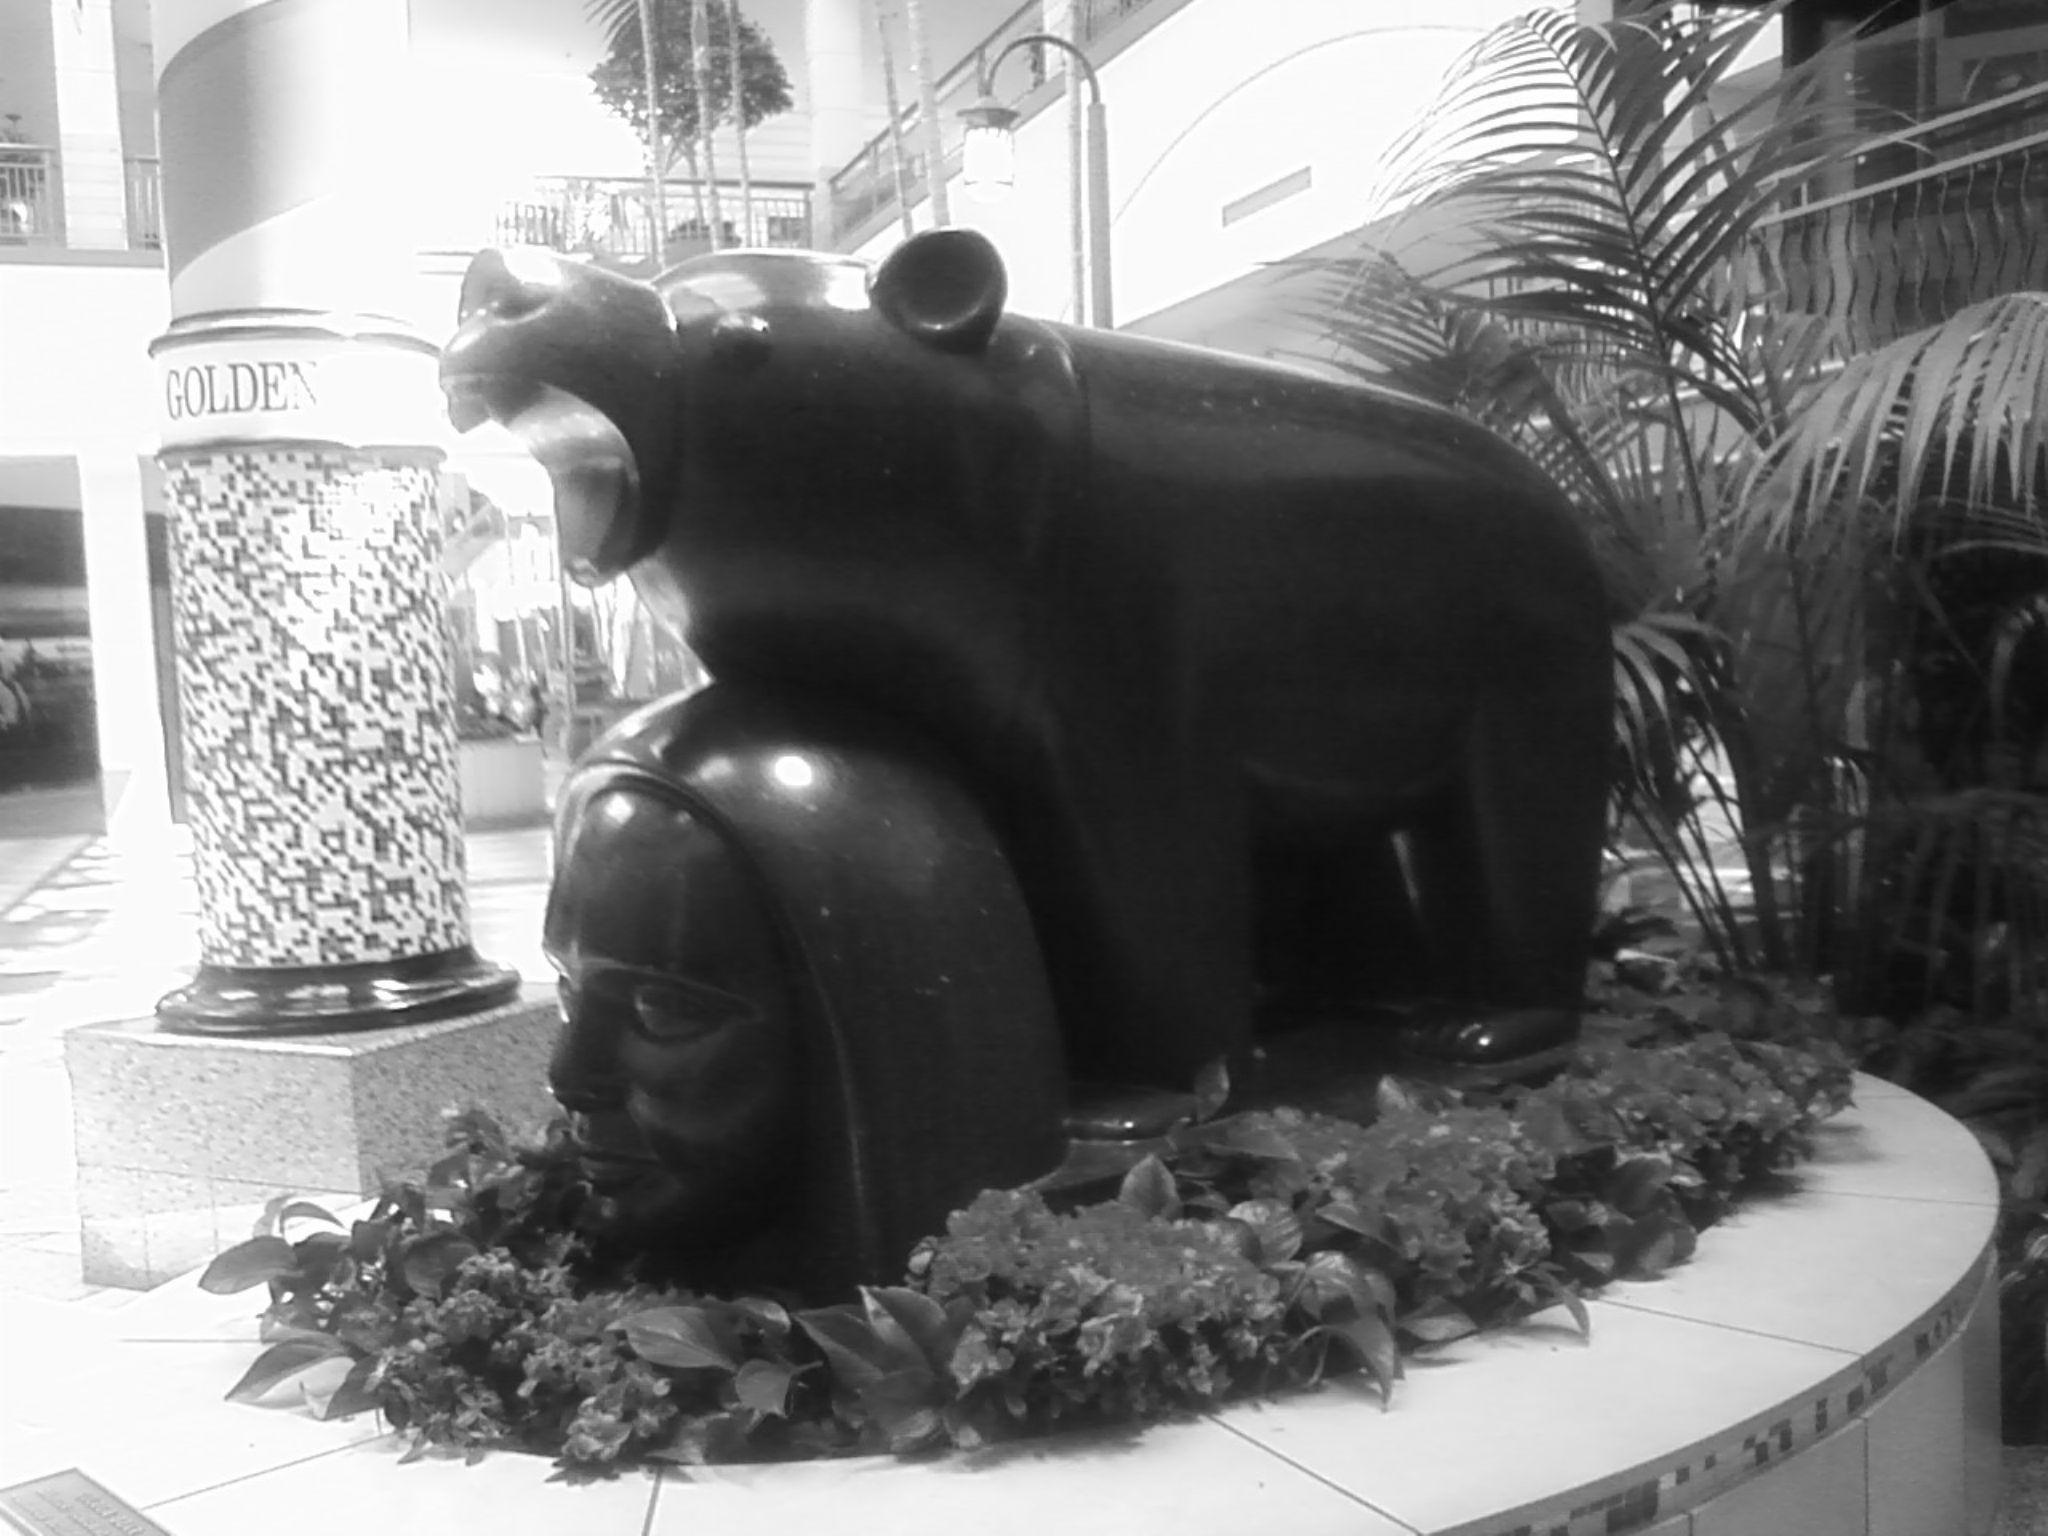 a bear in a shopping center 2 by Francisco Lopez